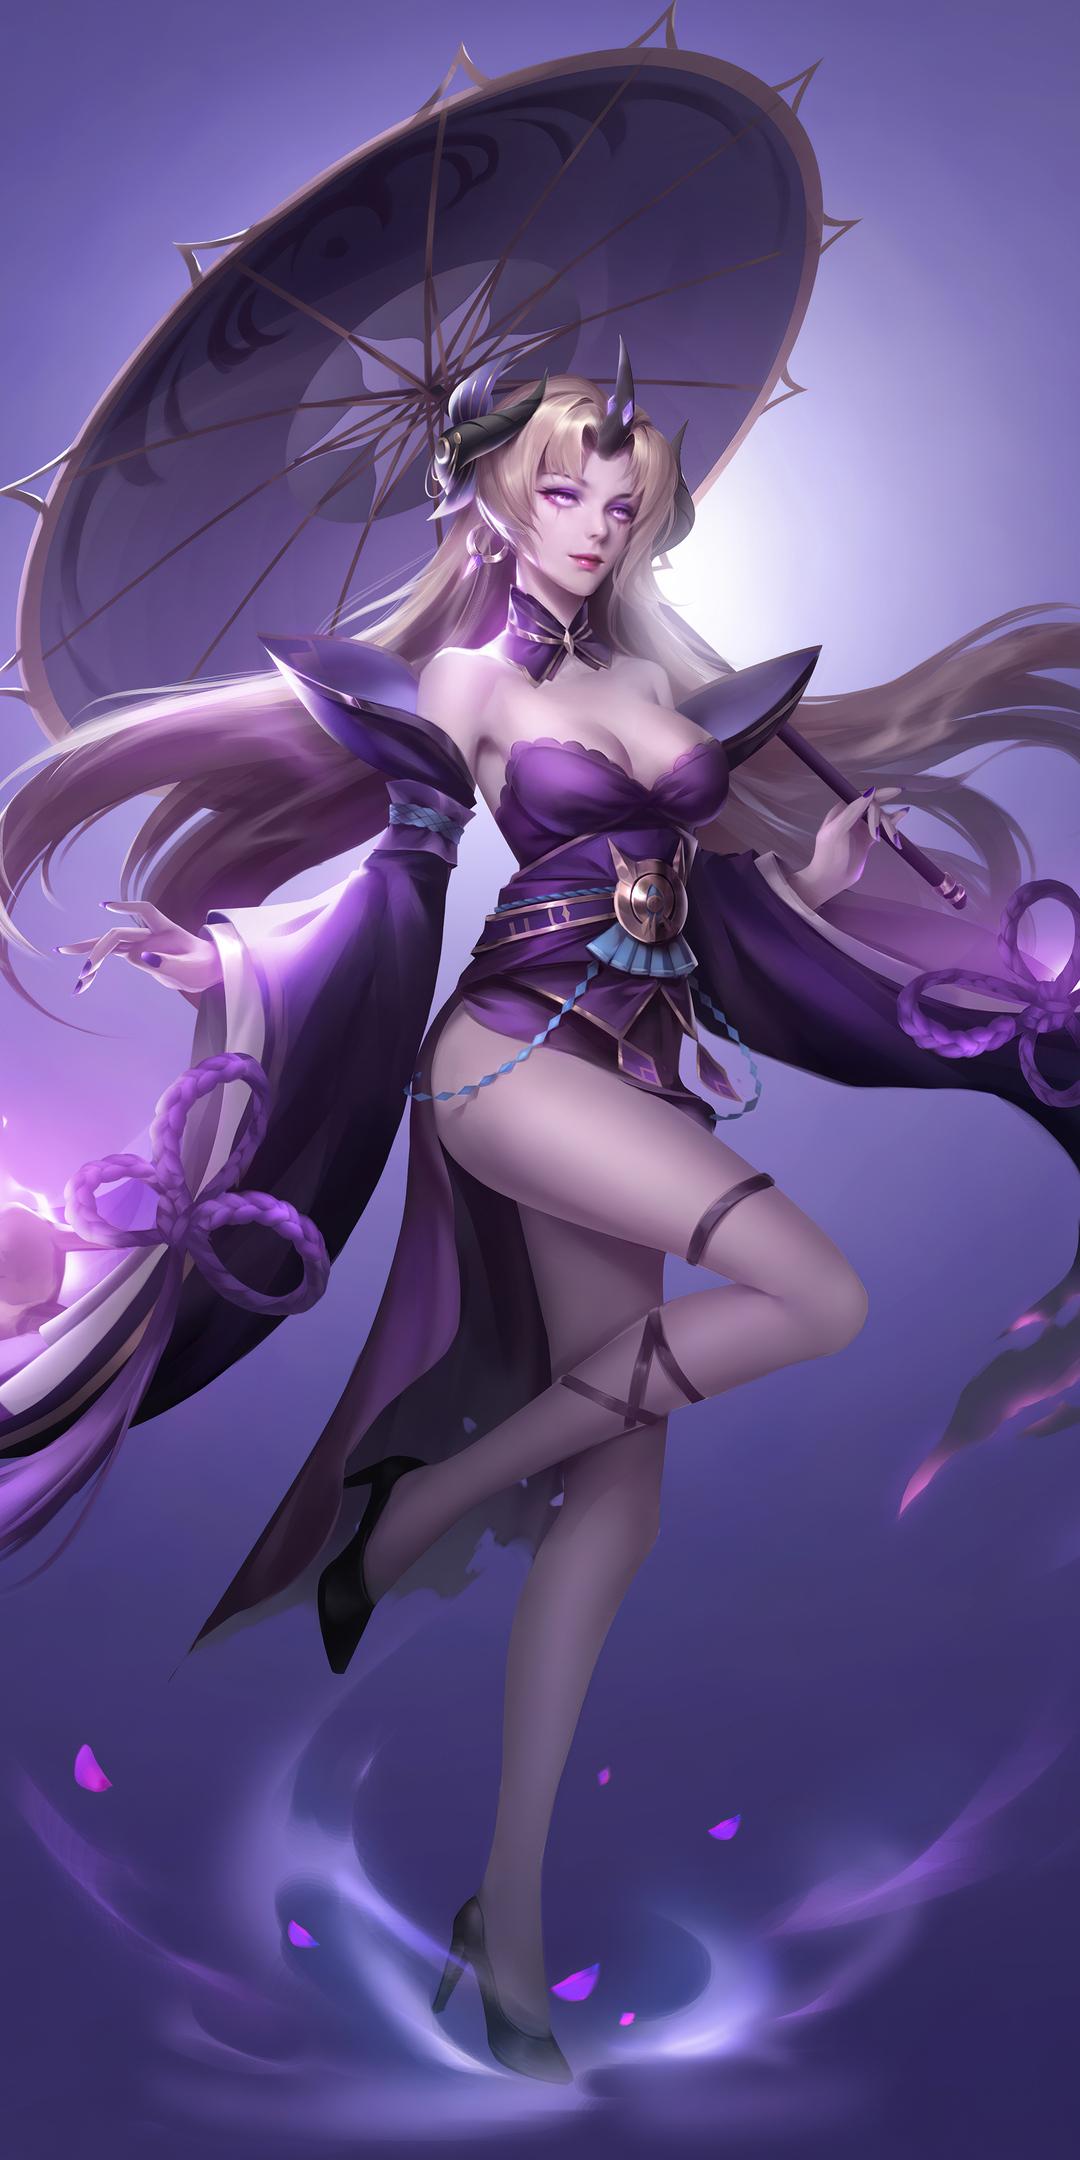 asian-beauty-fantasy-girl-4k-cw.jpg